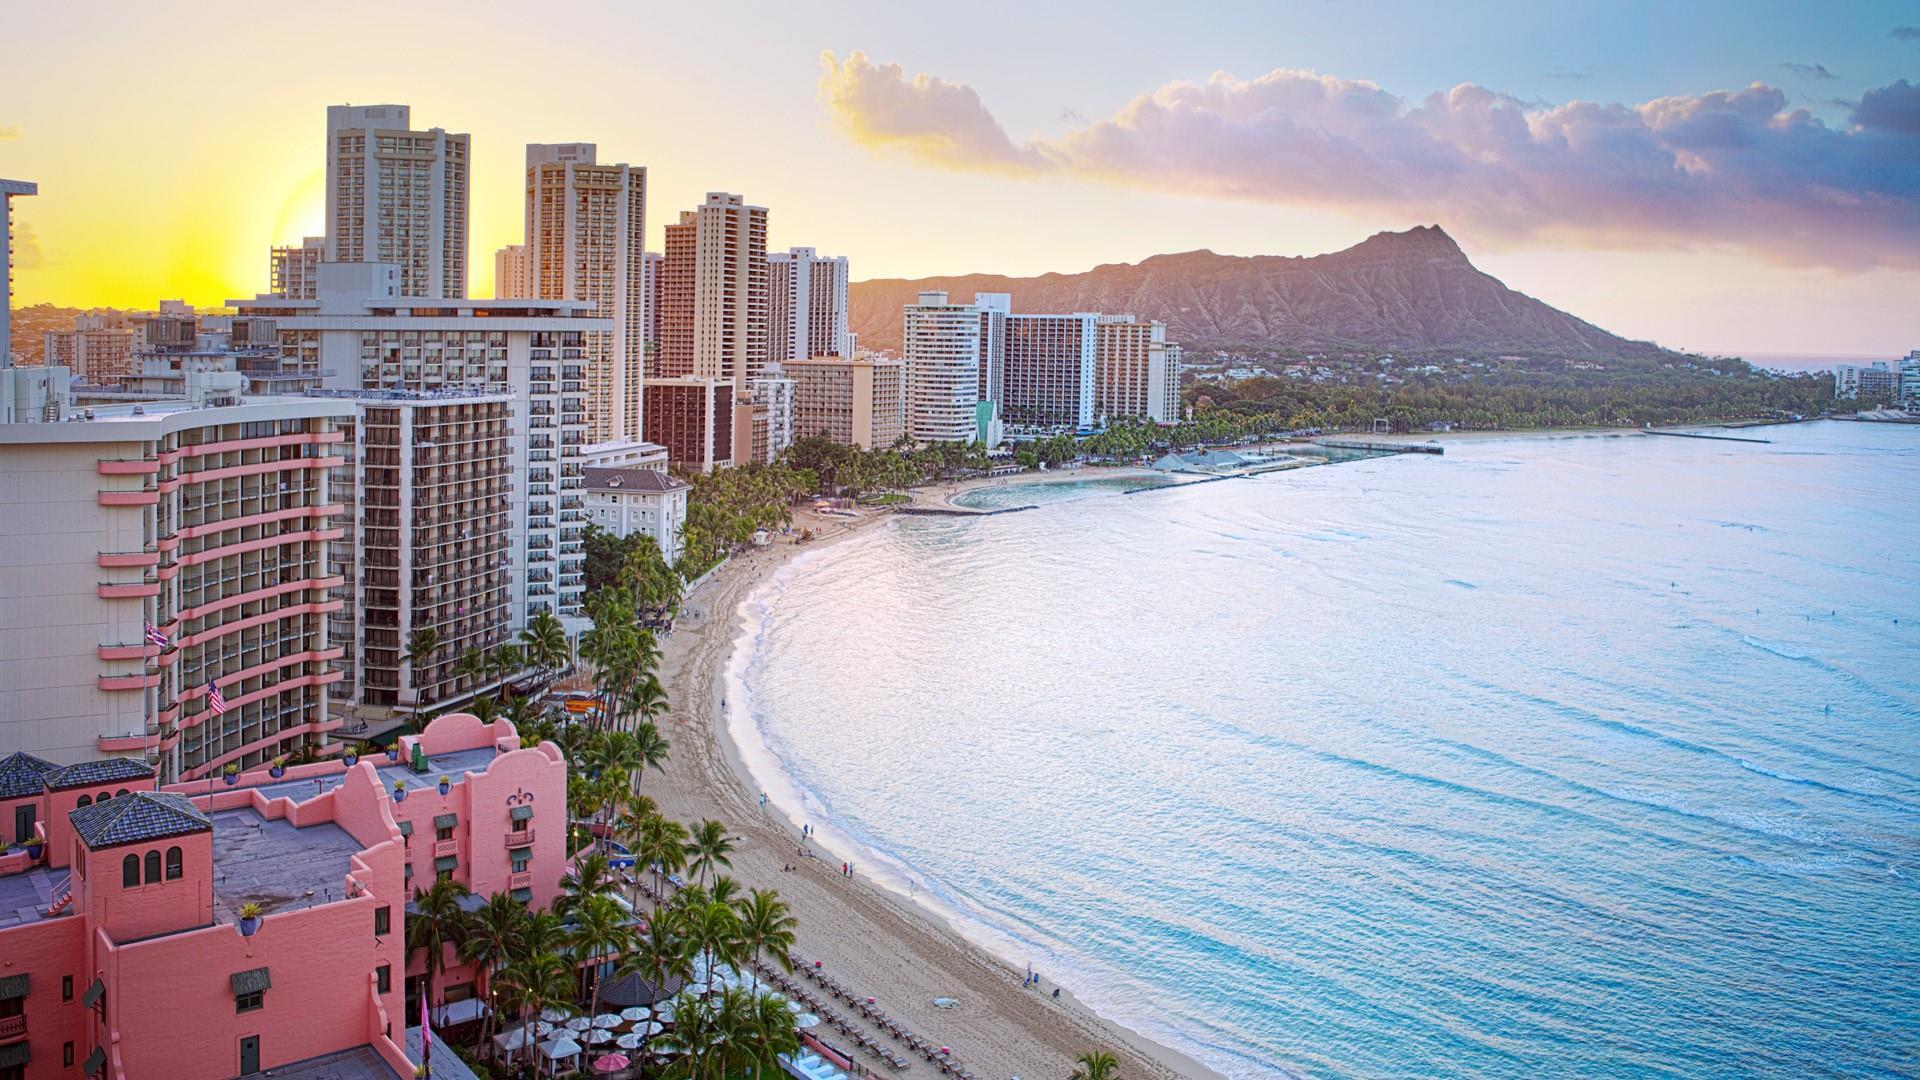 60 Oahu Beach Wallpapers   Download at WallpaperBro 1920x1080